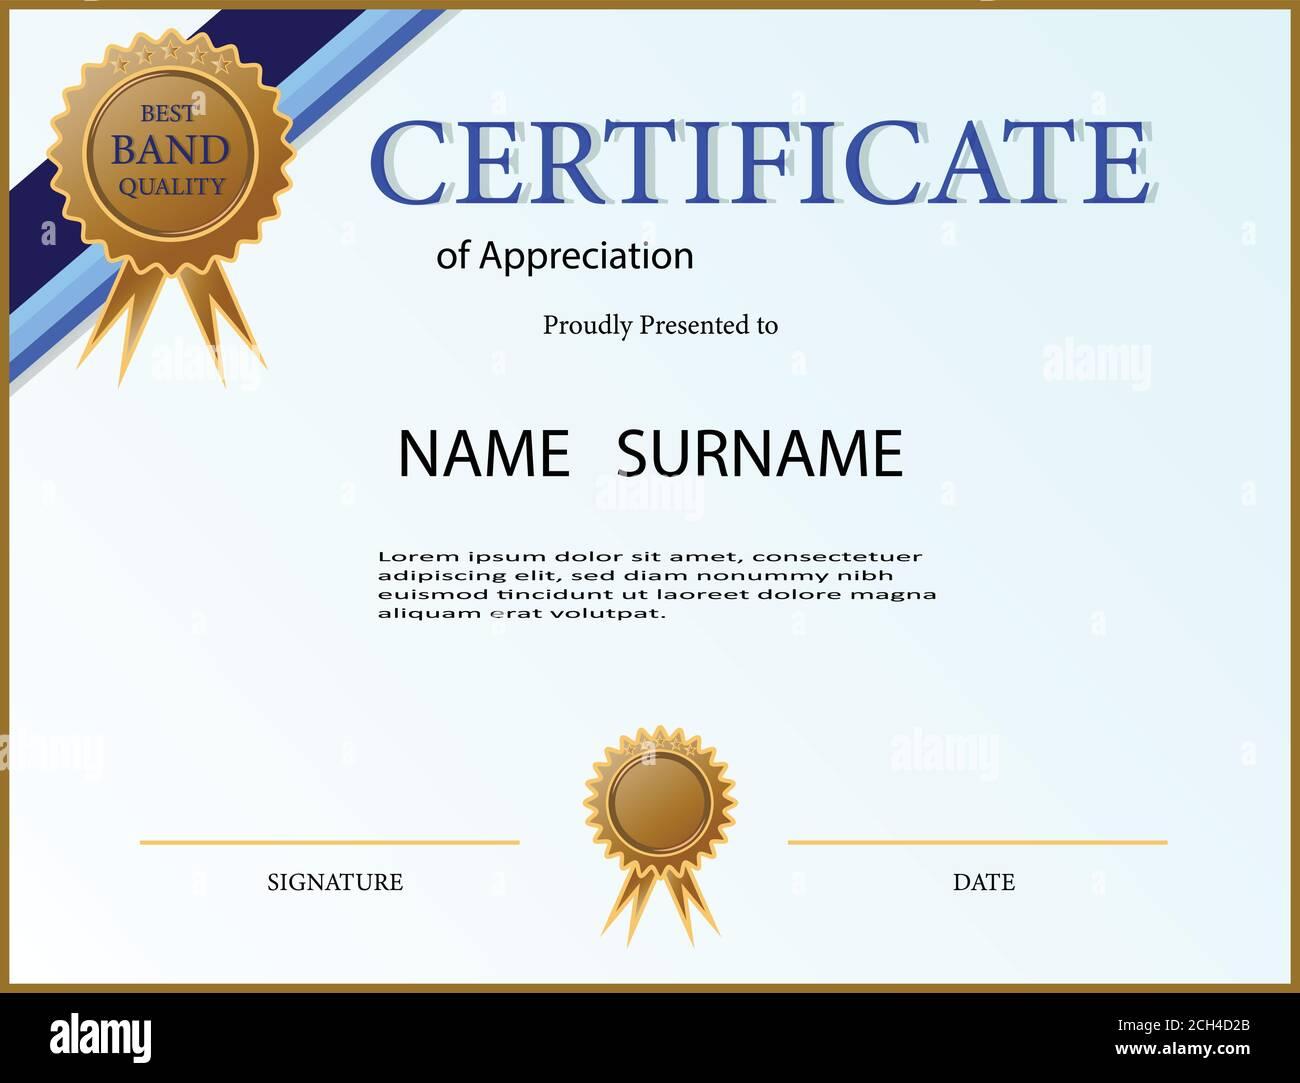 Certificate Appreciation Creative Template High Resolution Stock With Certificates Of Appreciation Template